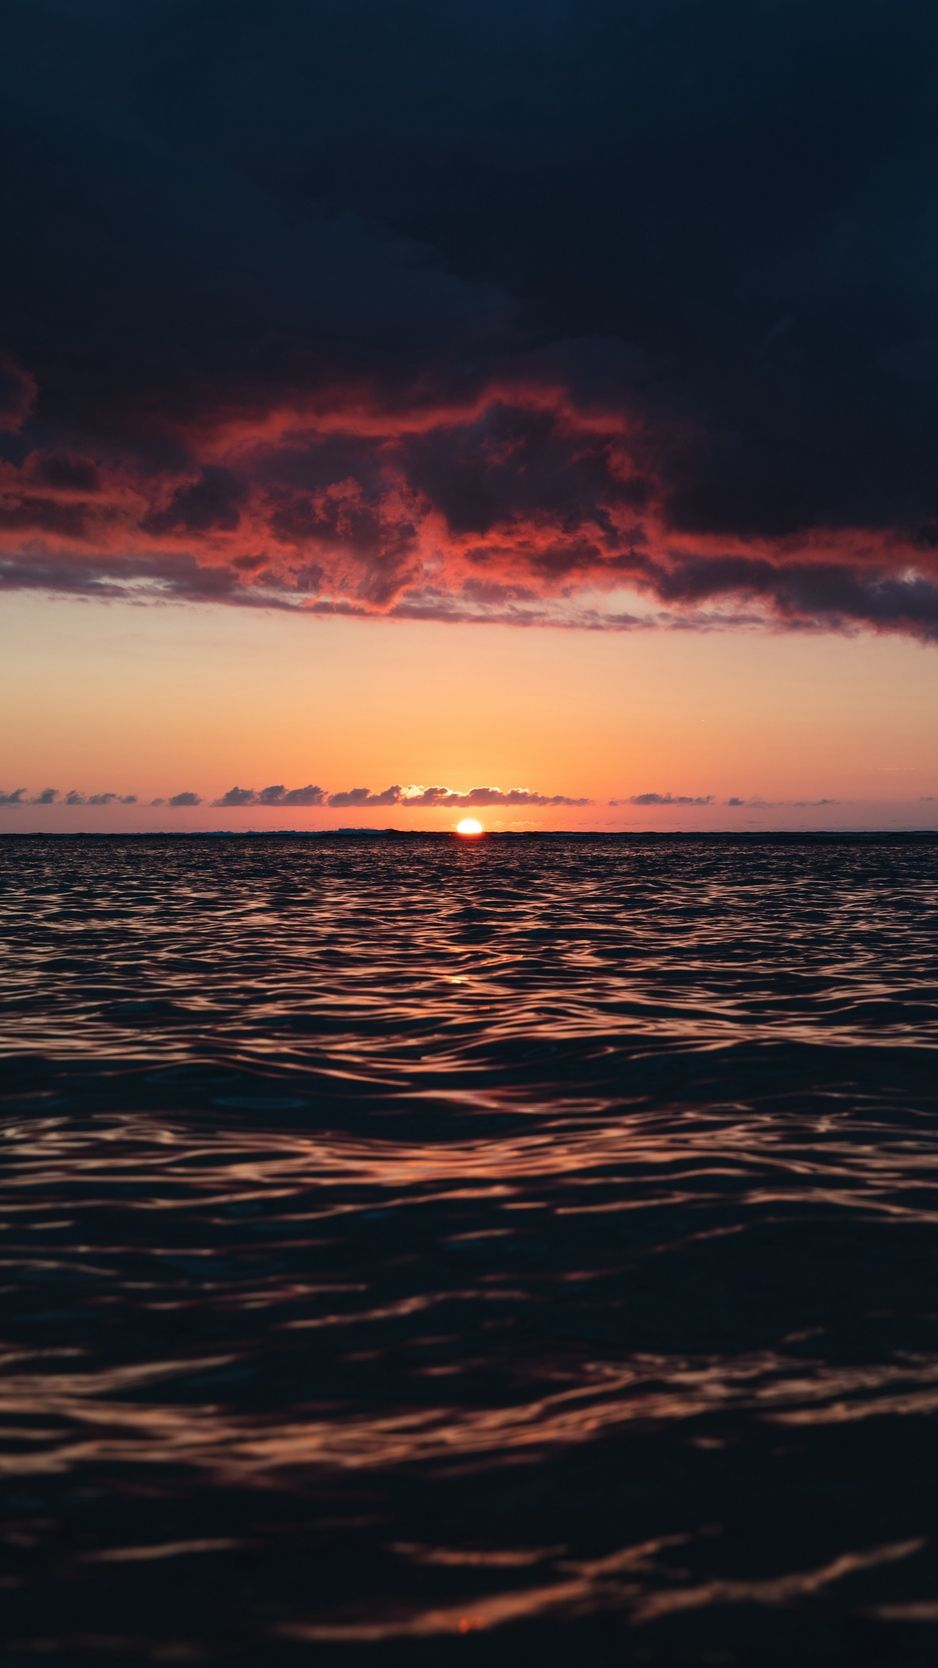 Download Wallpaper 938x1668 Horizon Sunset Sea Waves Sky Clouds Dark Island Reunion France Iphone Landscape Wallpaper Sunset Wallpaper Ocean Wallpaper